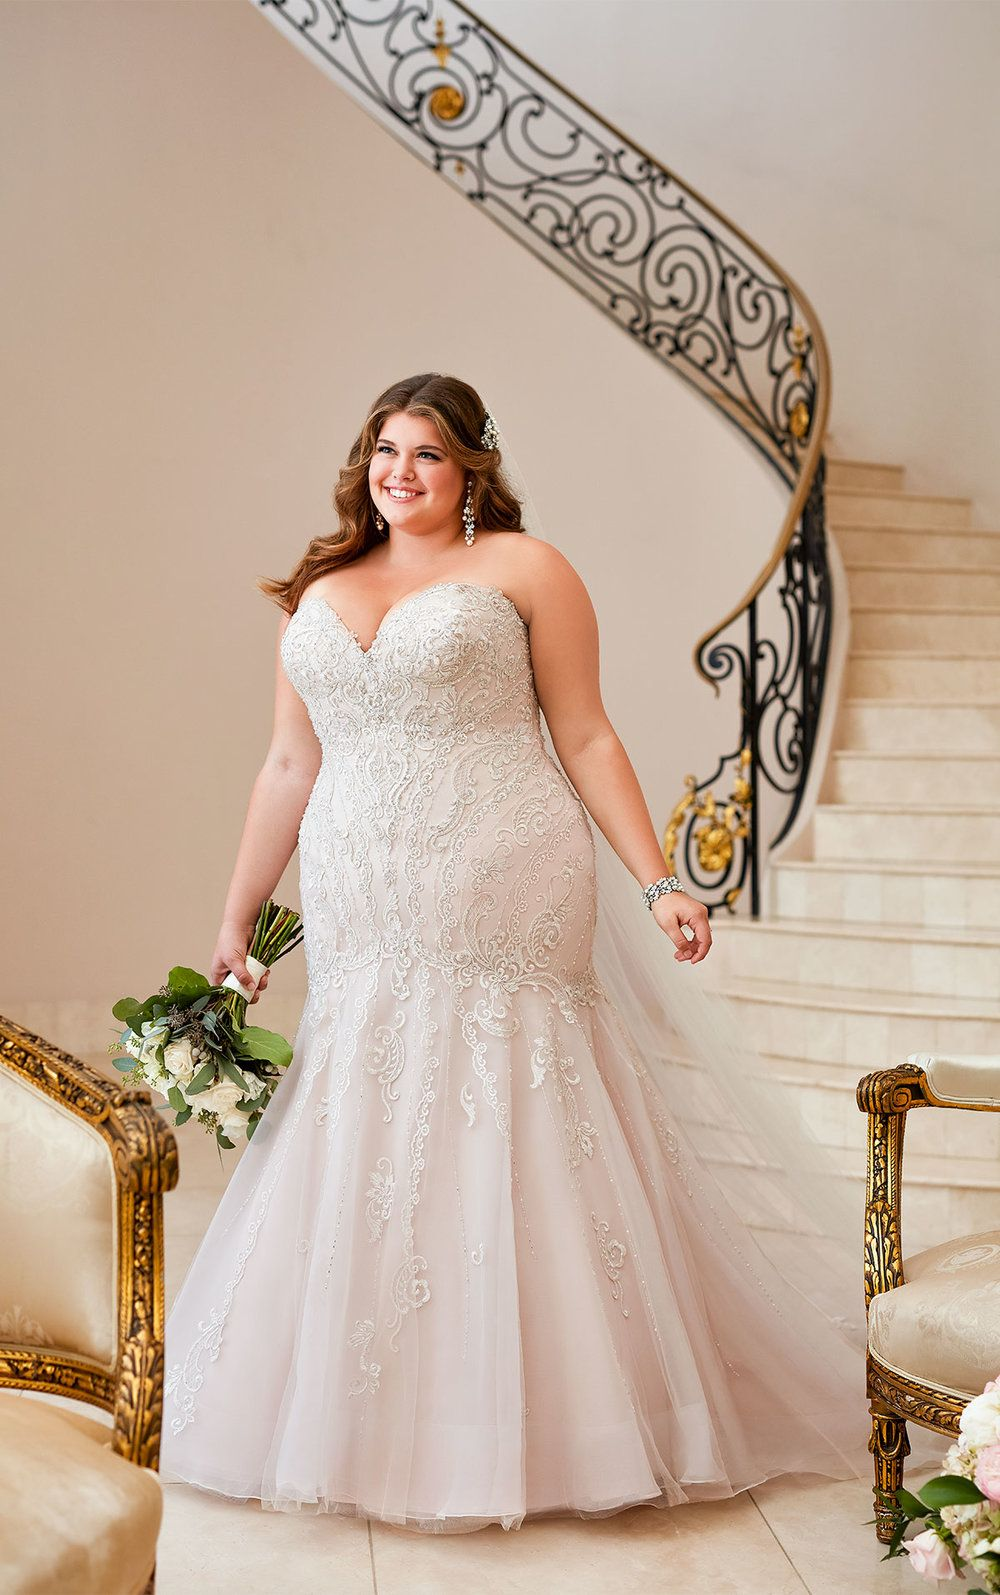 20 Stella York Wedding Dresses at Bridal Traditions Omaha ideas ...